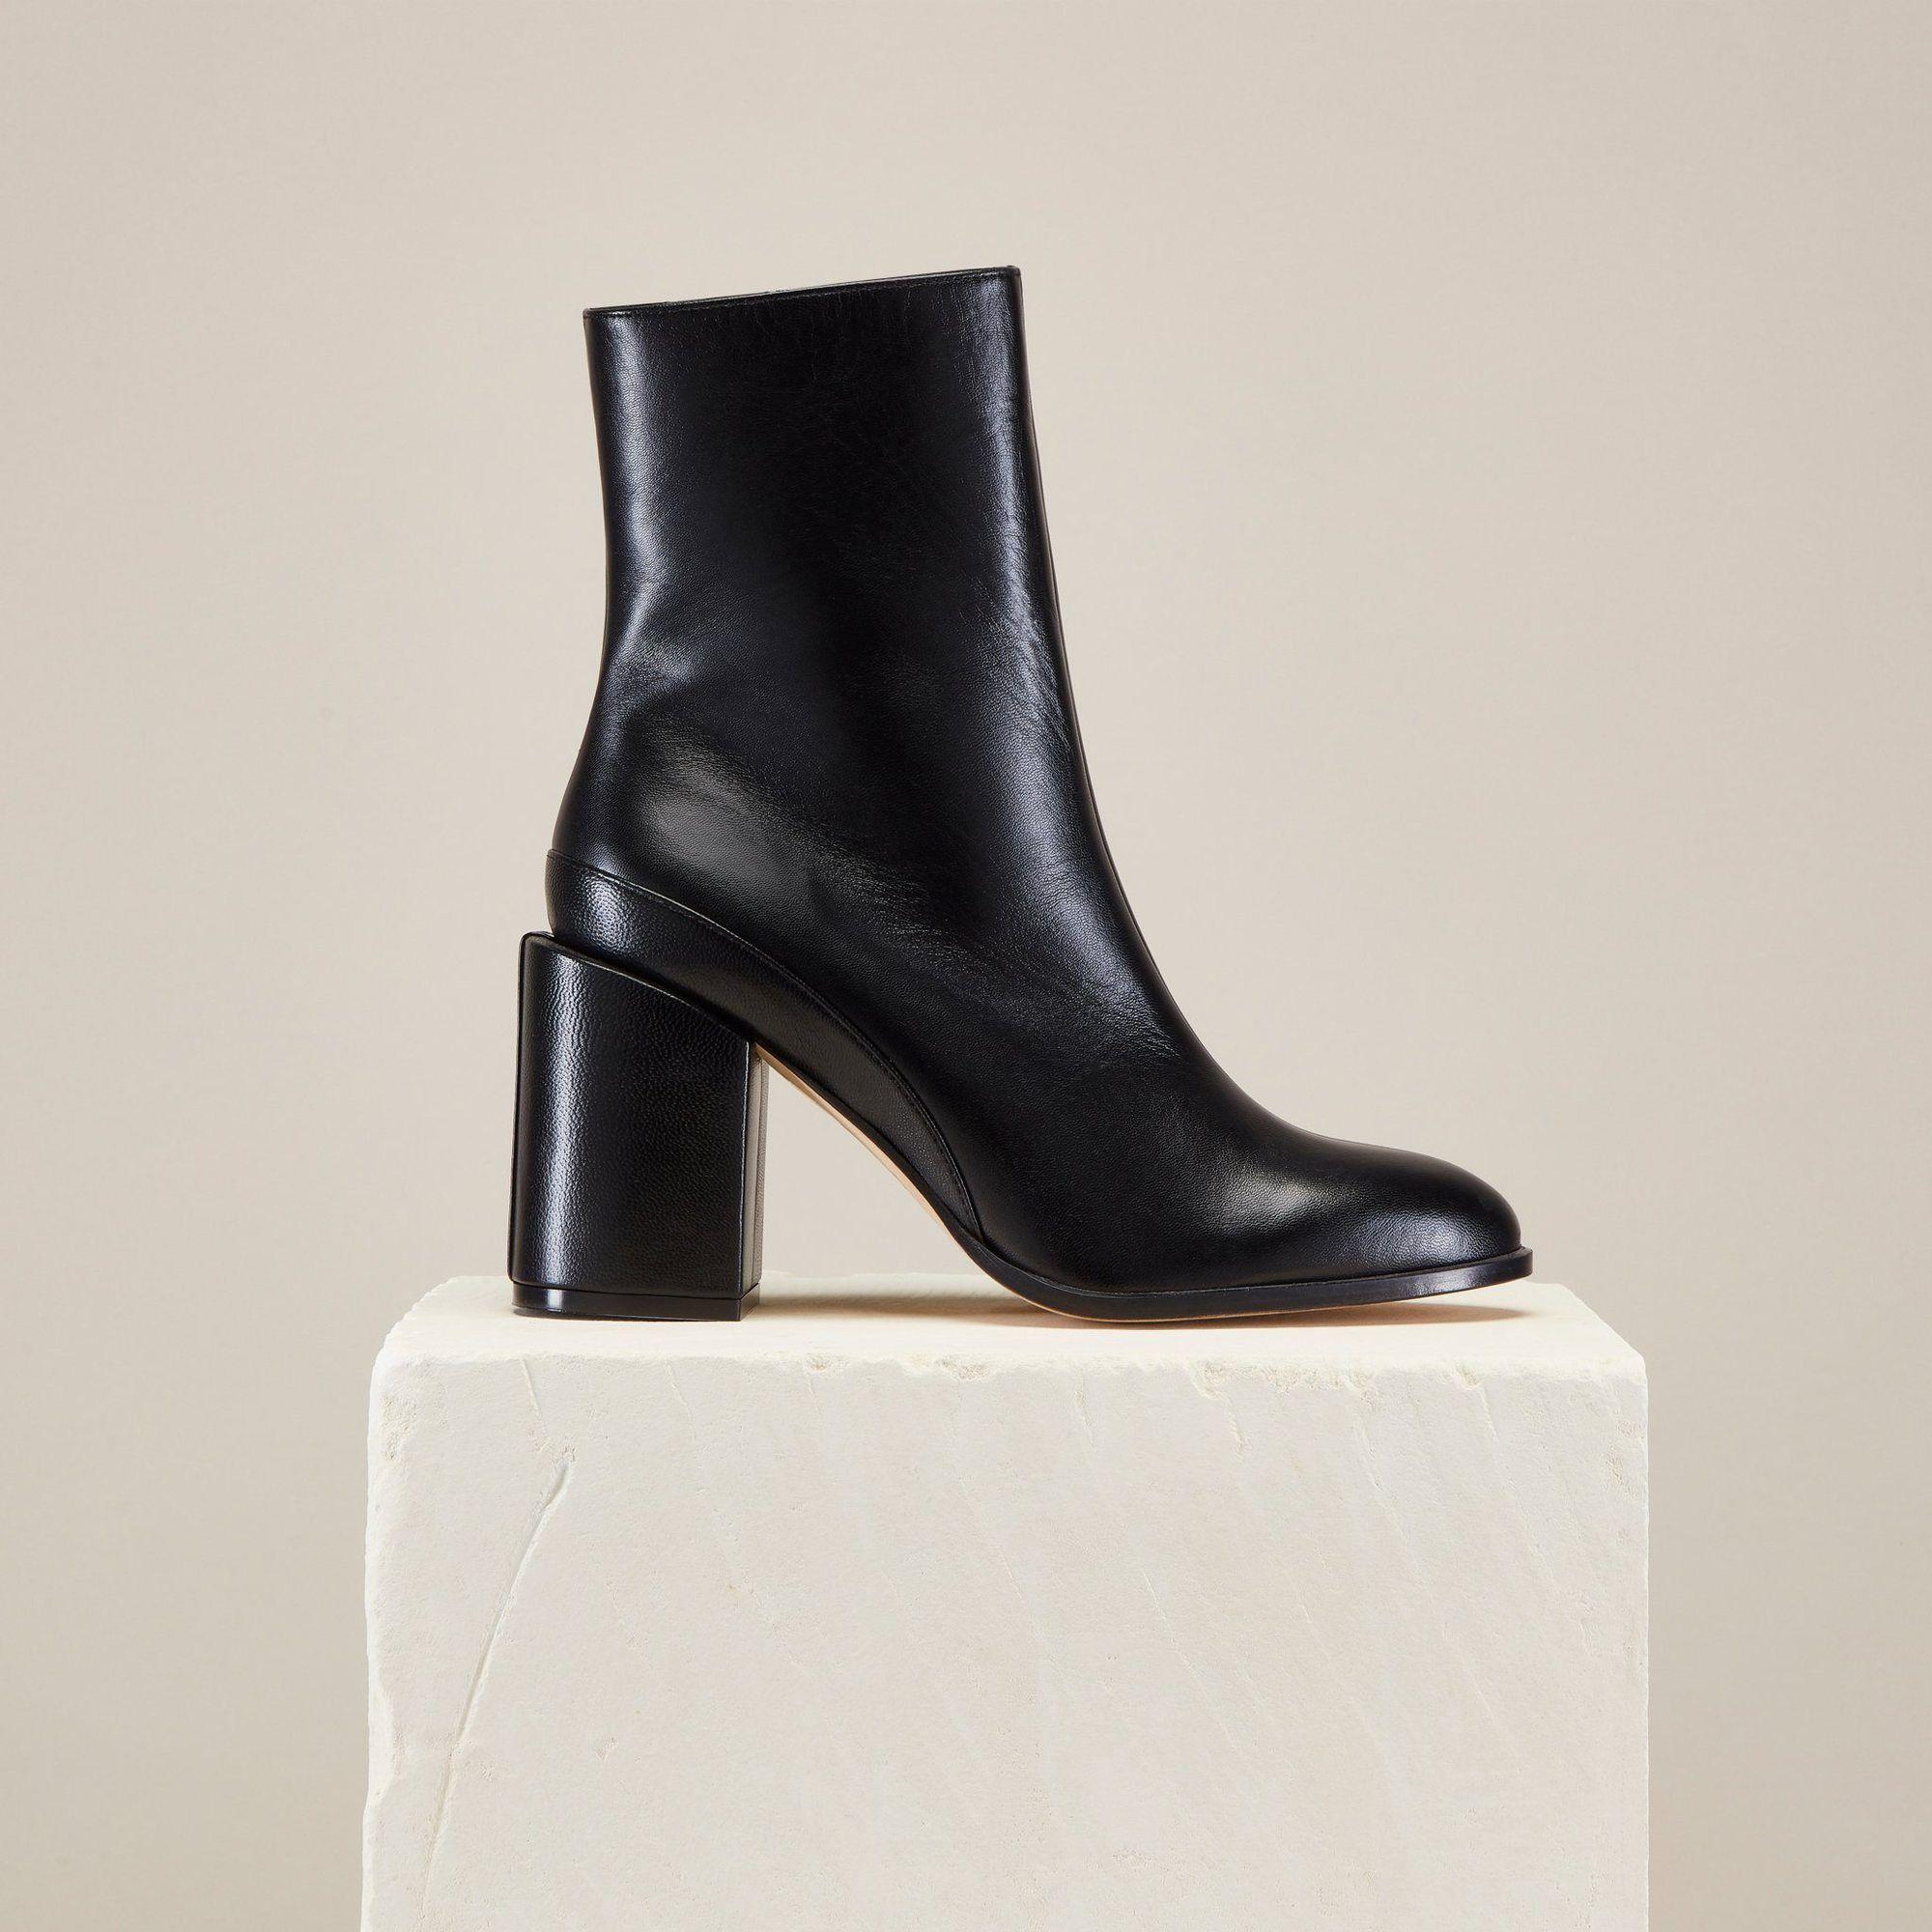 1f9ab40b05d Designer luxury Italian made timeless classic ankle booties, black leather  block heel women's, Spirit boots, Dear Frances